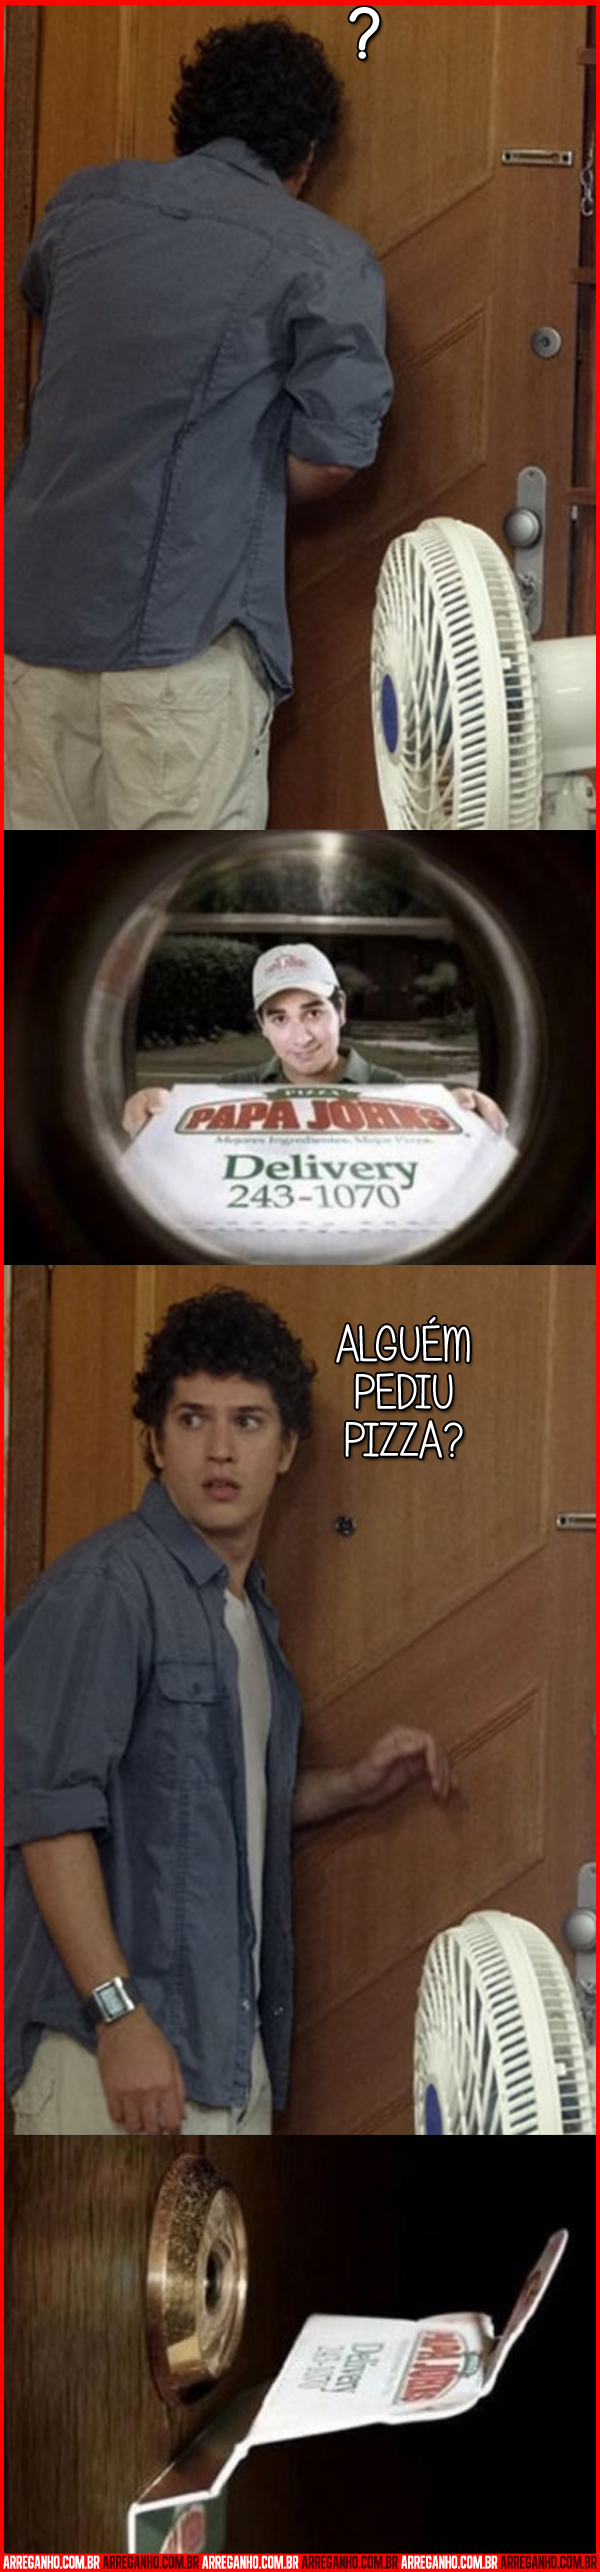 Trollagem do Entregador de Pizza